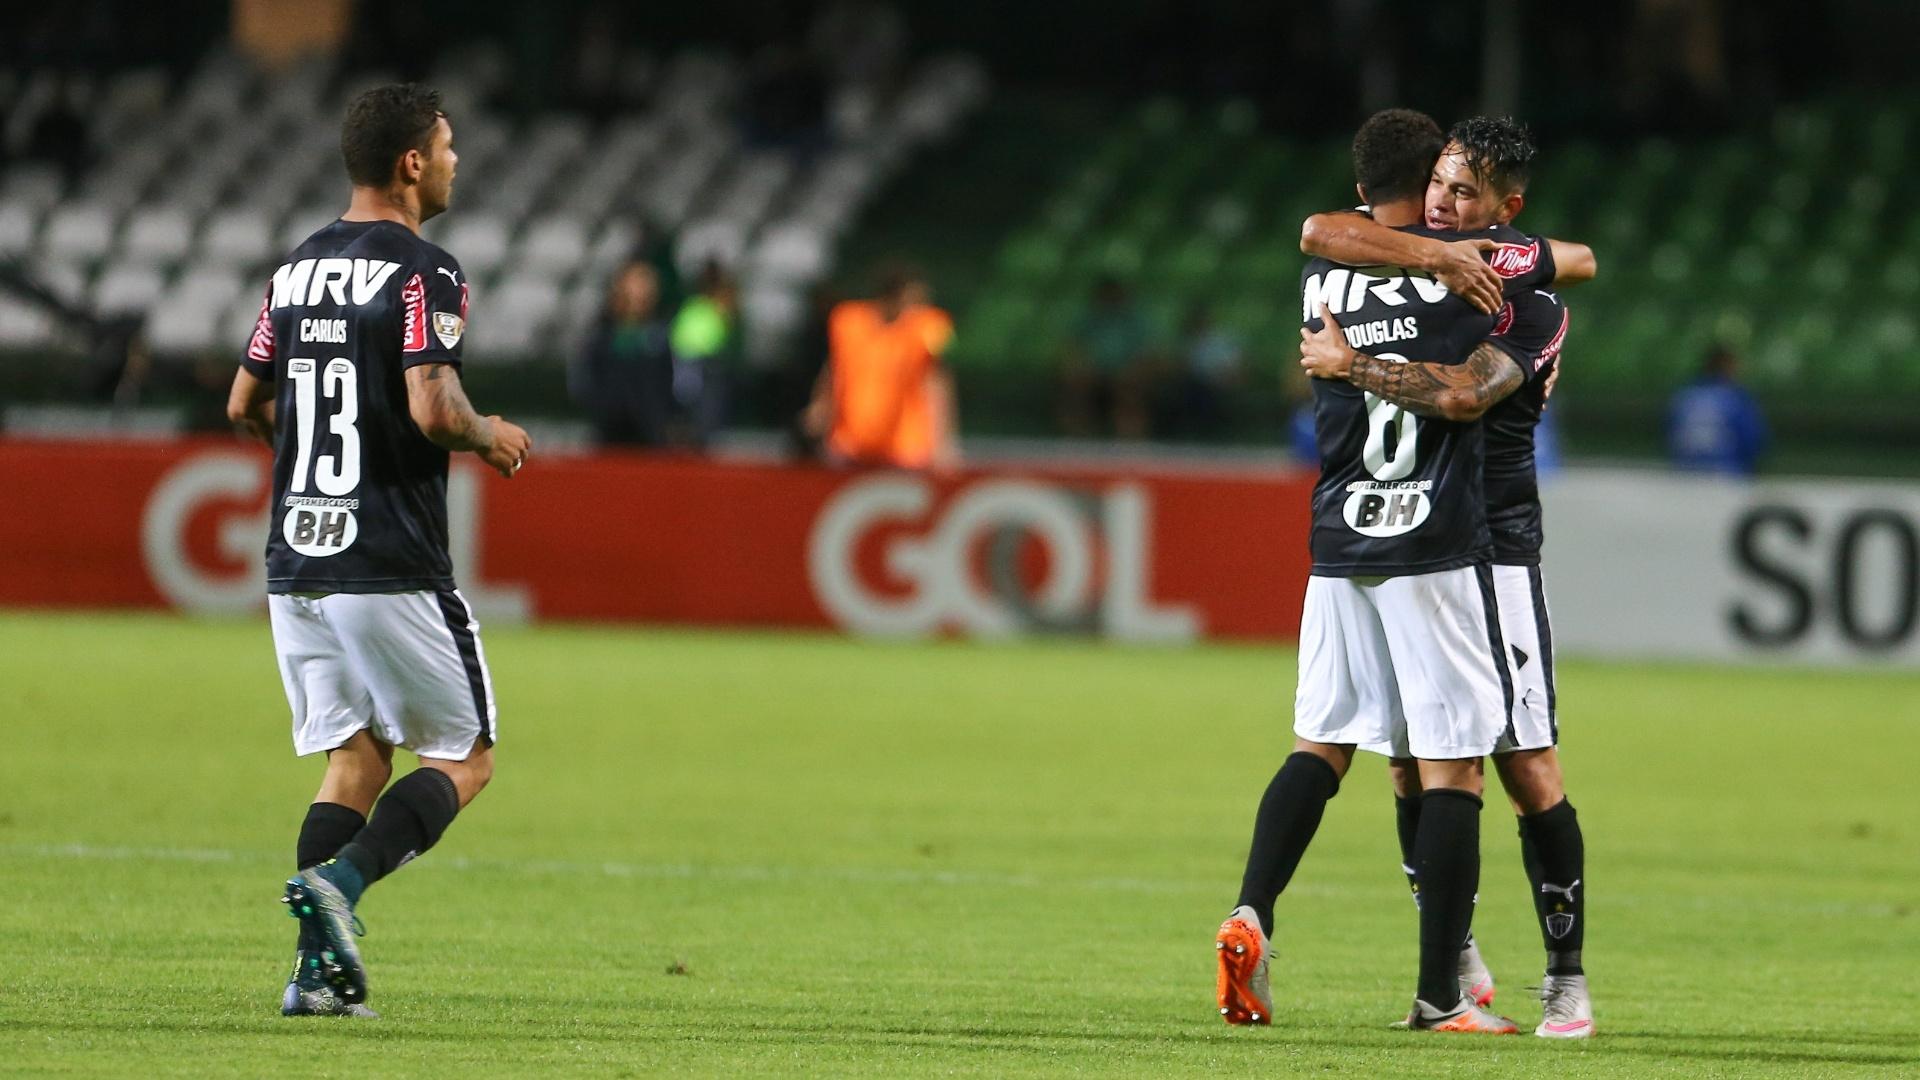 Jogadores do Atlético-MG comemoram gol marcado contra o Coritiba no Couto Pereira